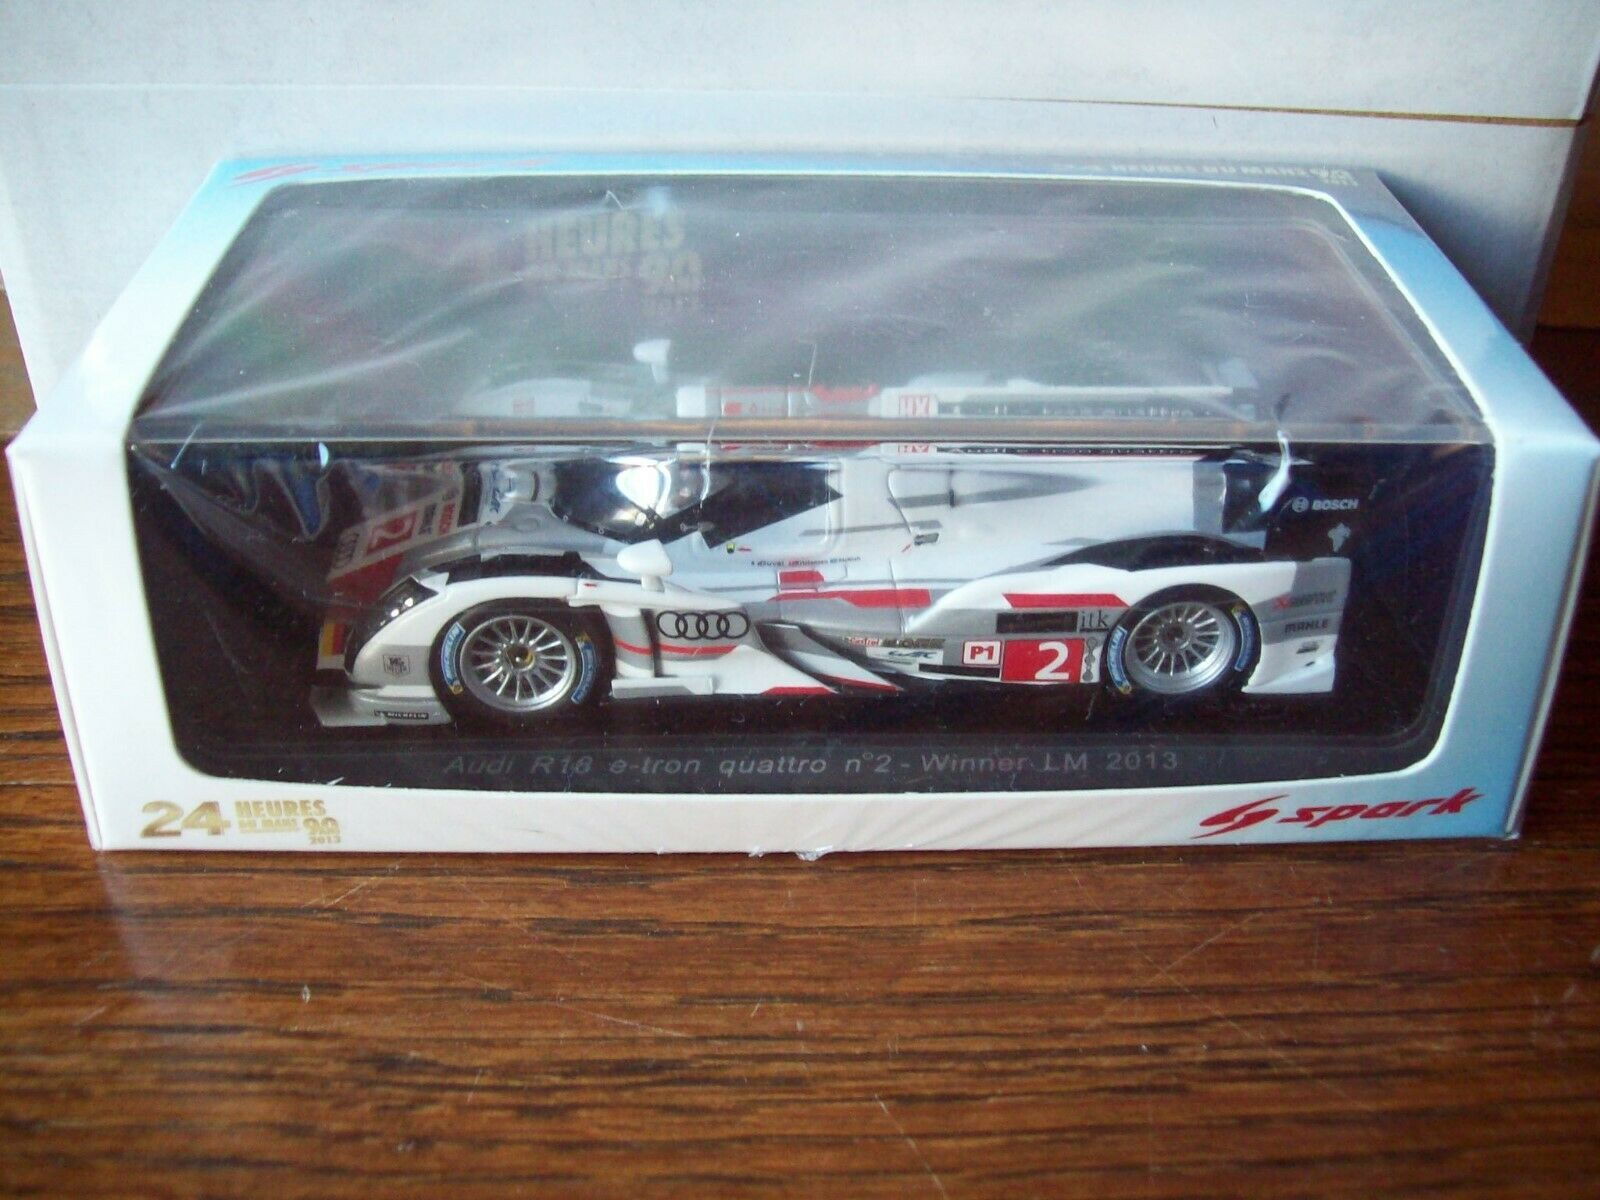 1 43 Spark 43LM13I R18 e-tron Quattro Winner Lm 2013  2 Duval McNish Kriste